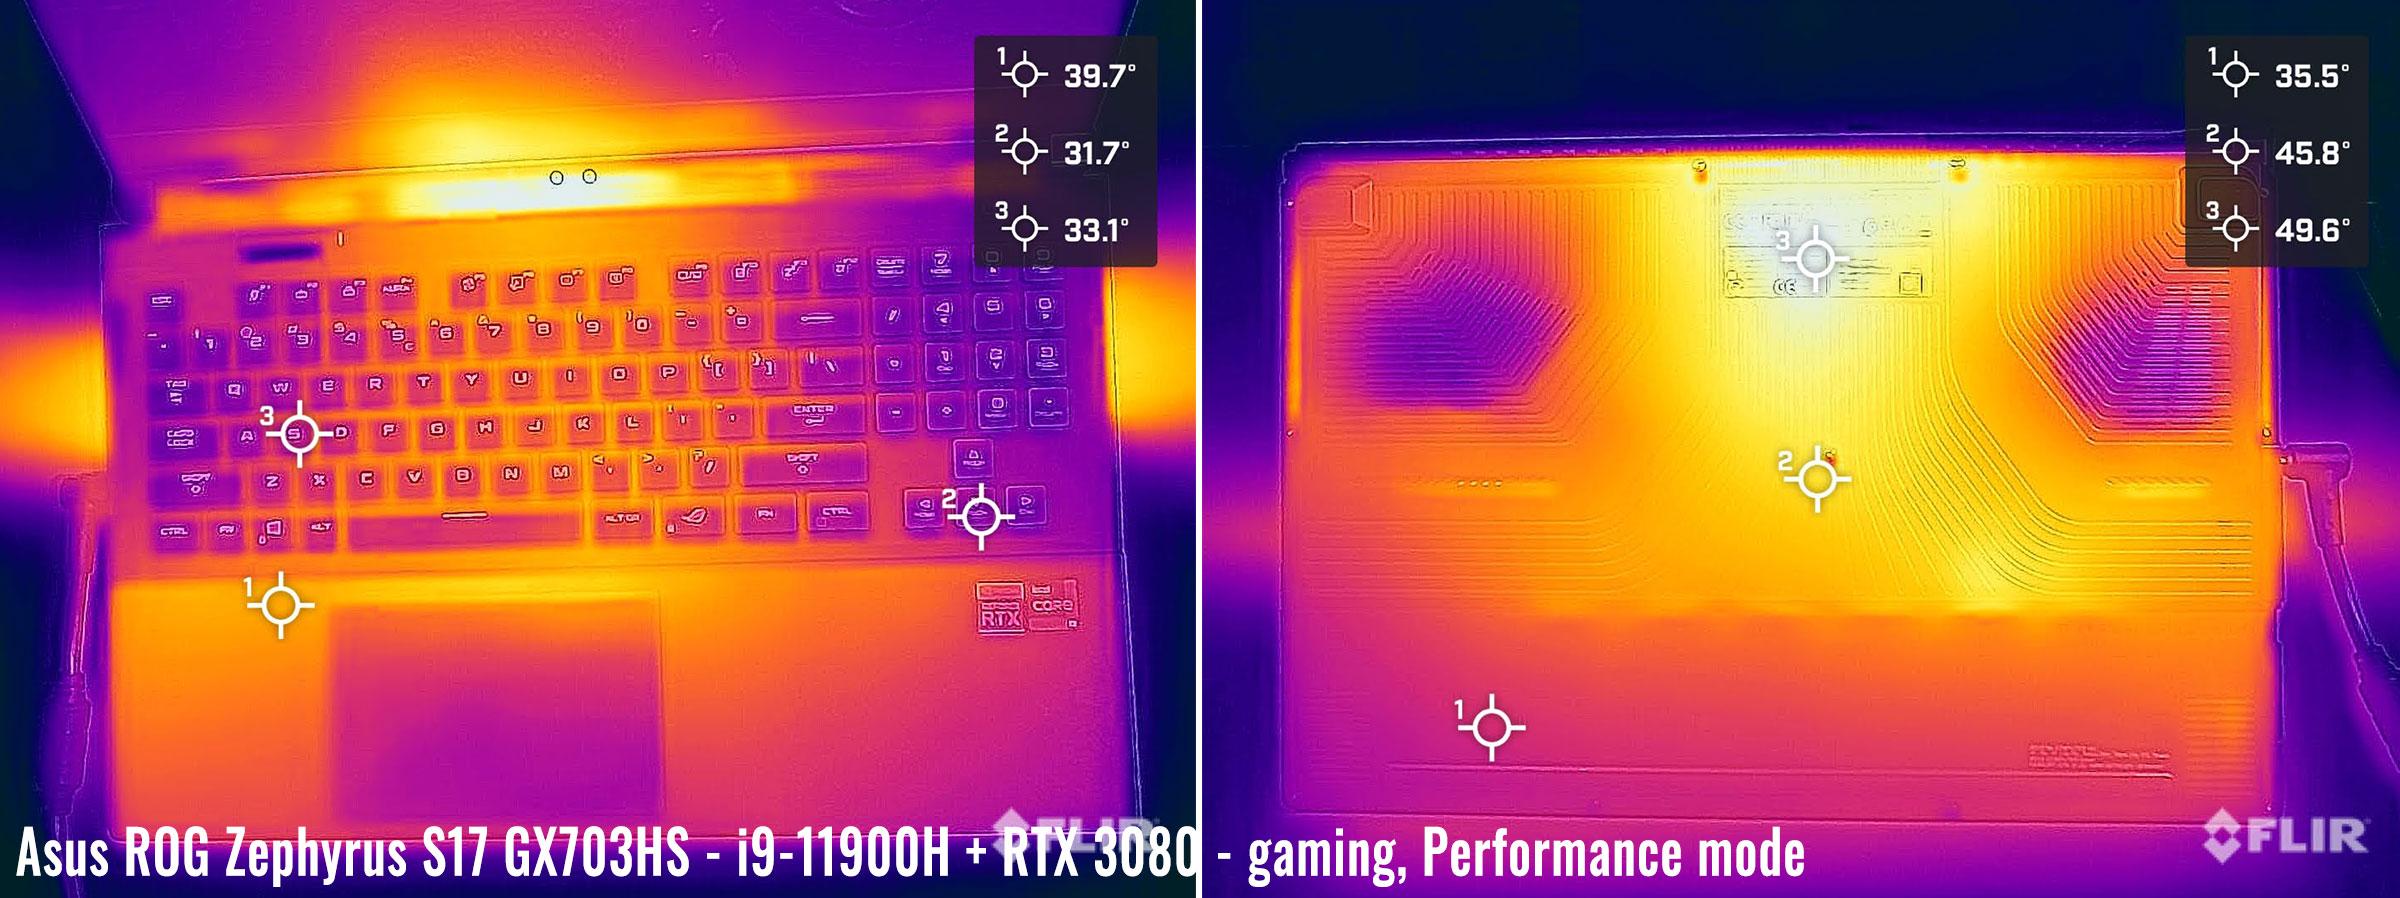 temperatures zephyrus17 gaming performance